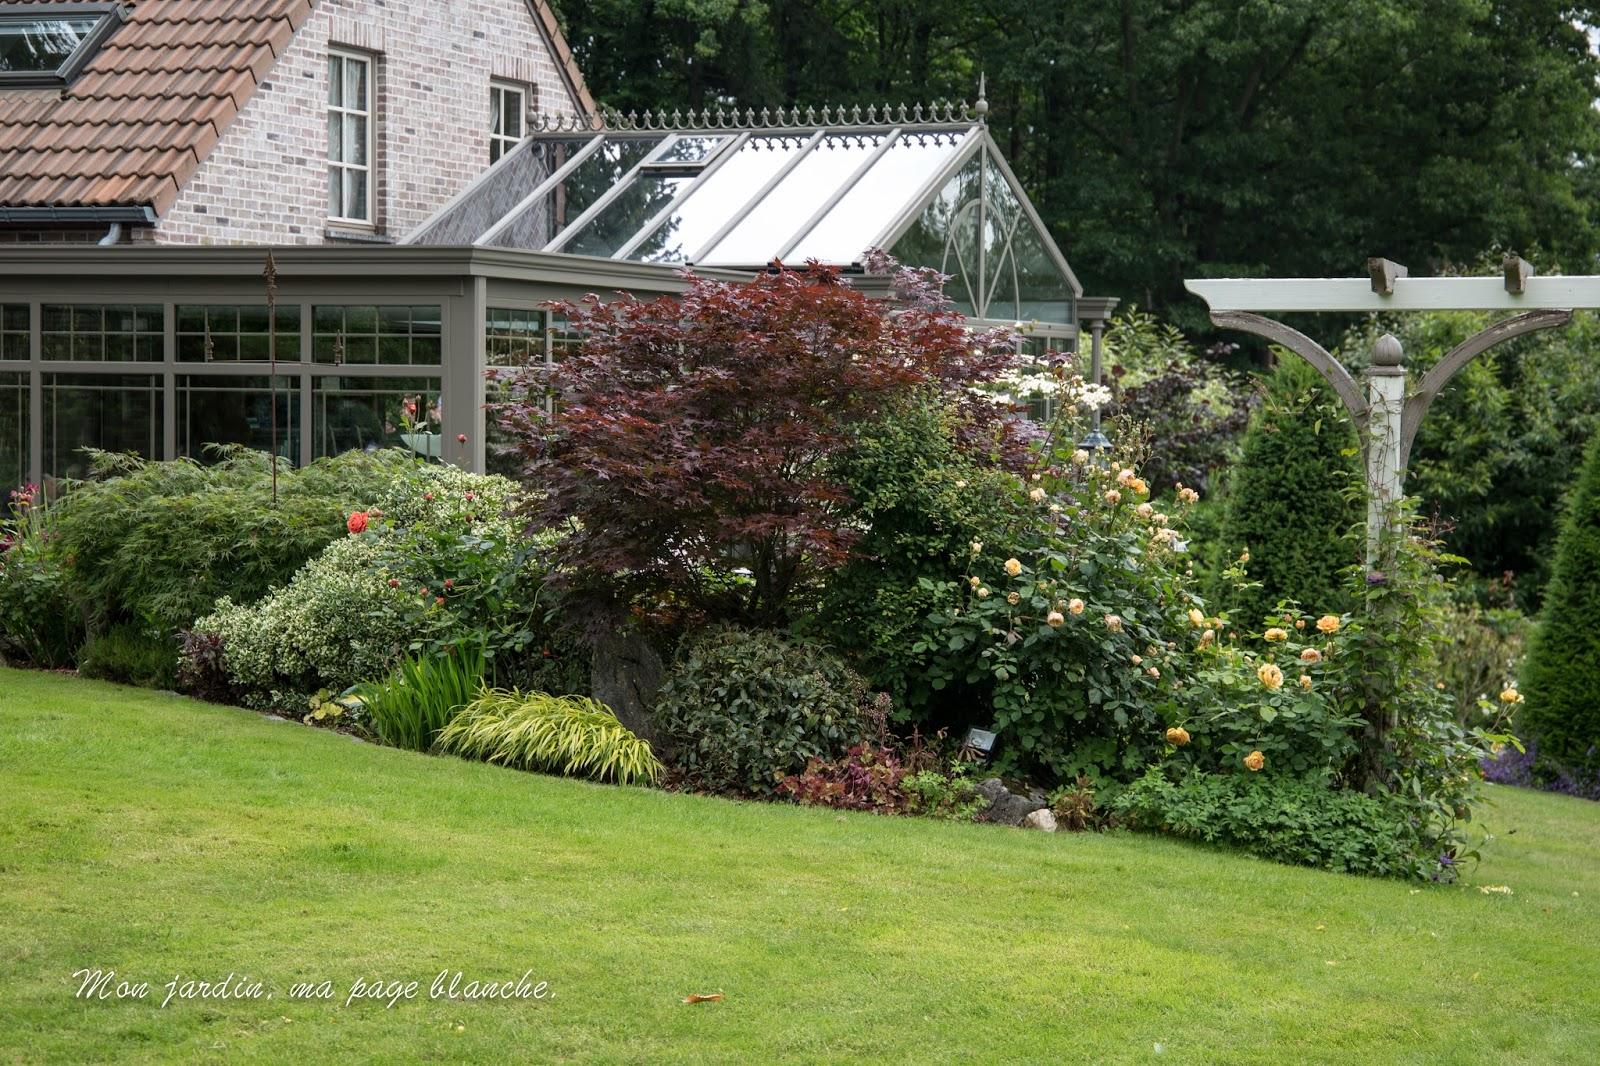 Mon jardin, ma page blanche ...